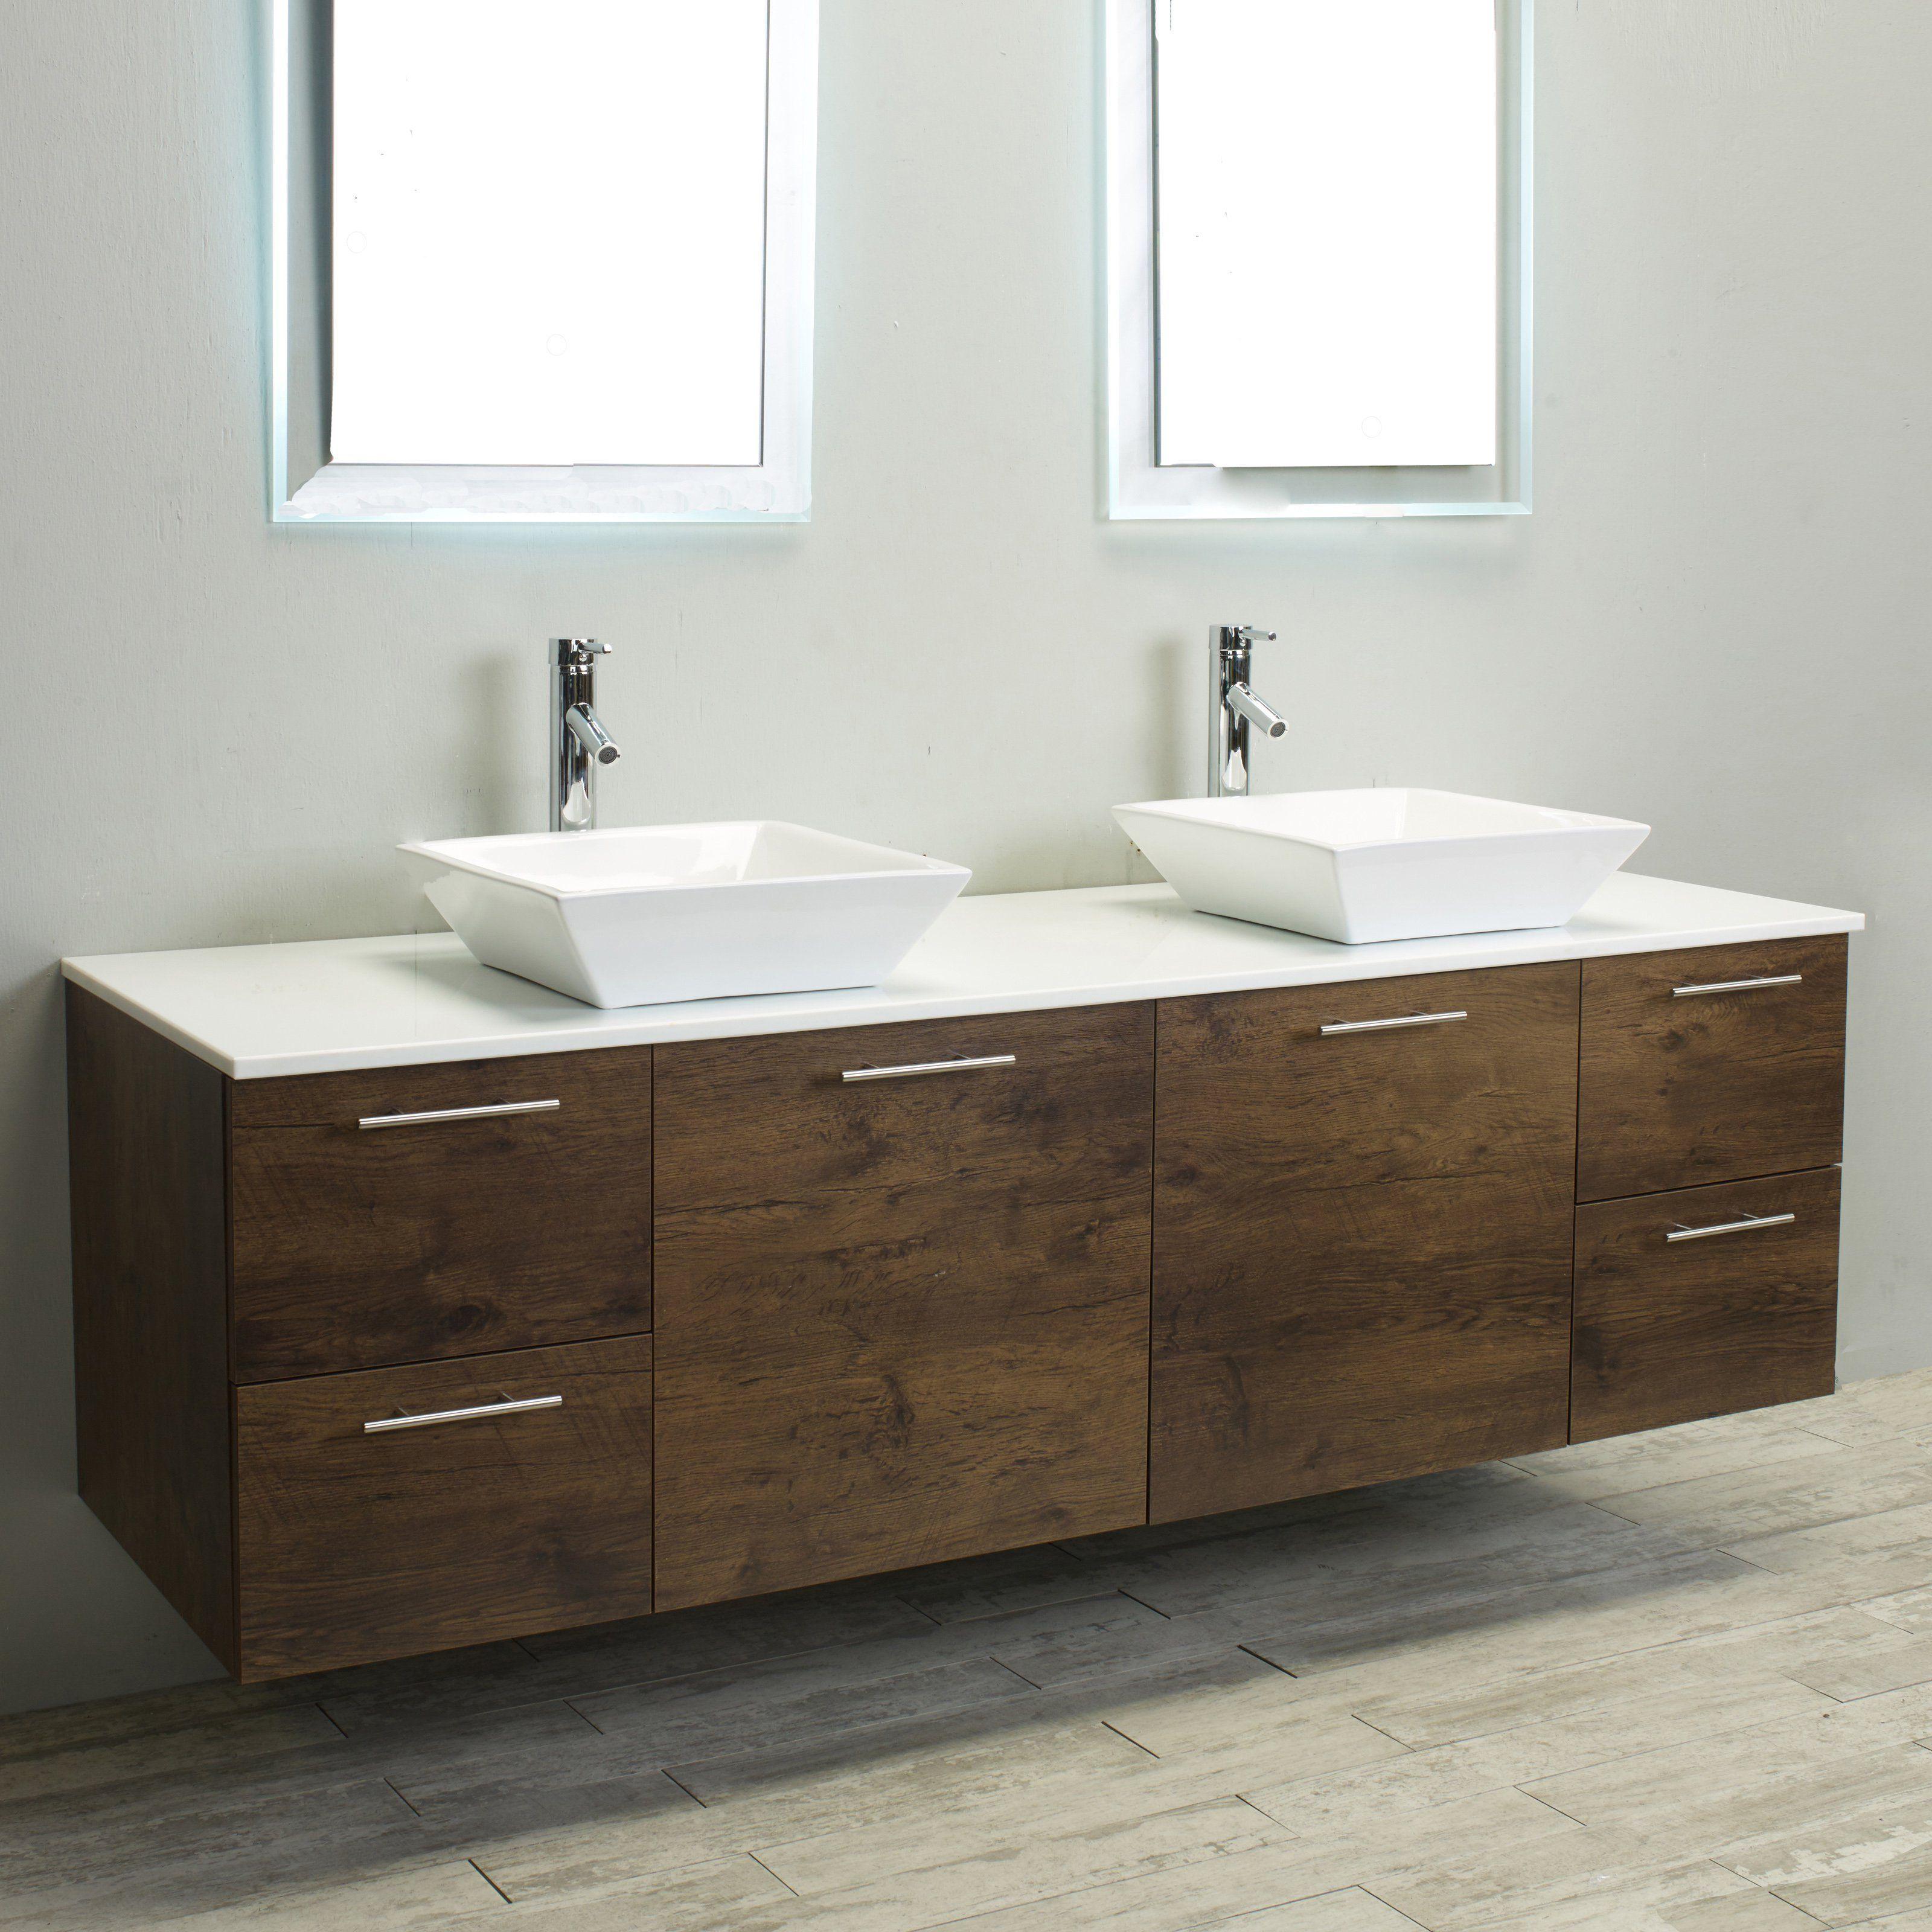 Eviva Luxury 72 in. Double Bathroom Vanity - EVVN823-72RSWD ...